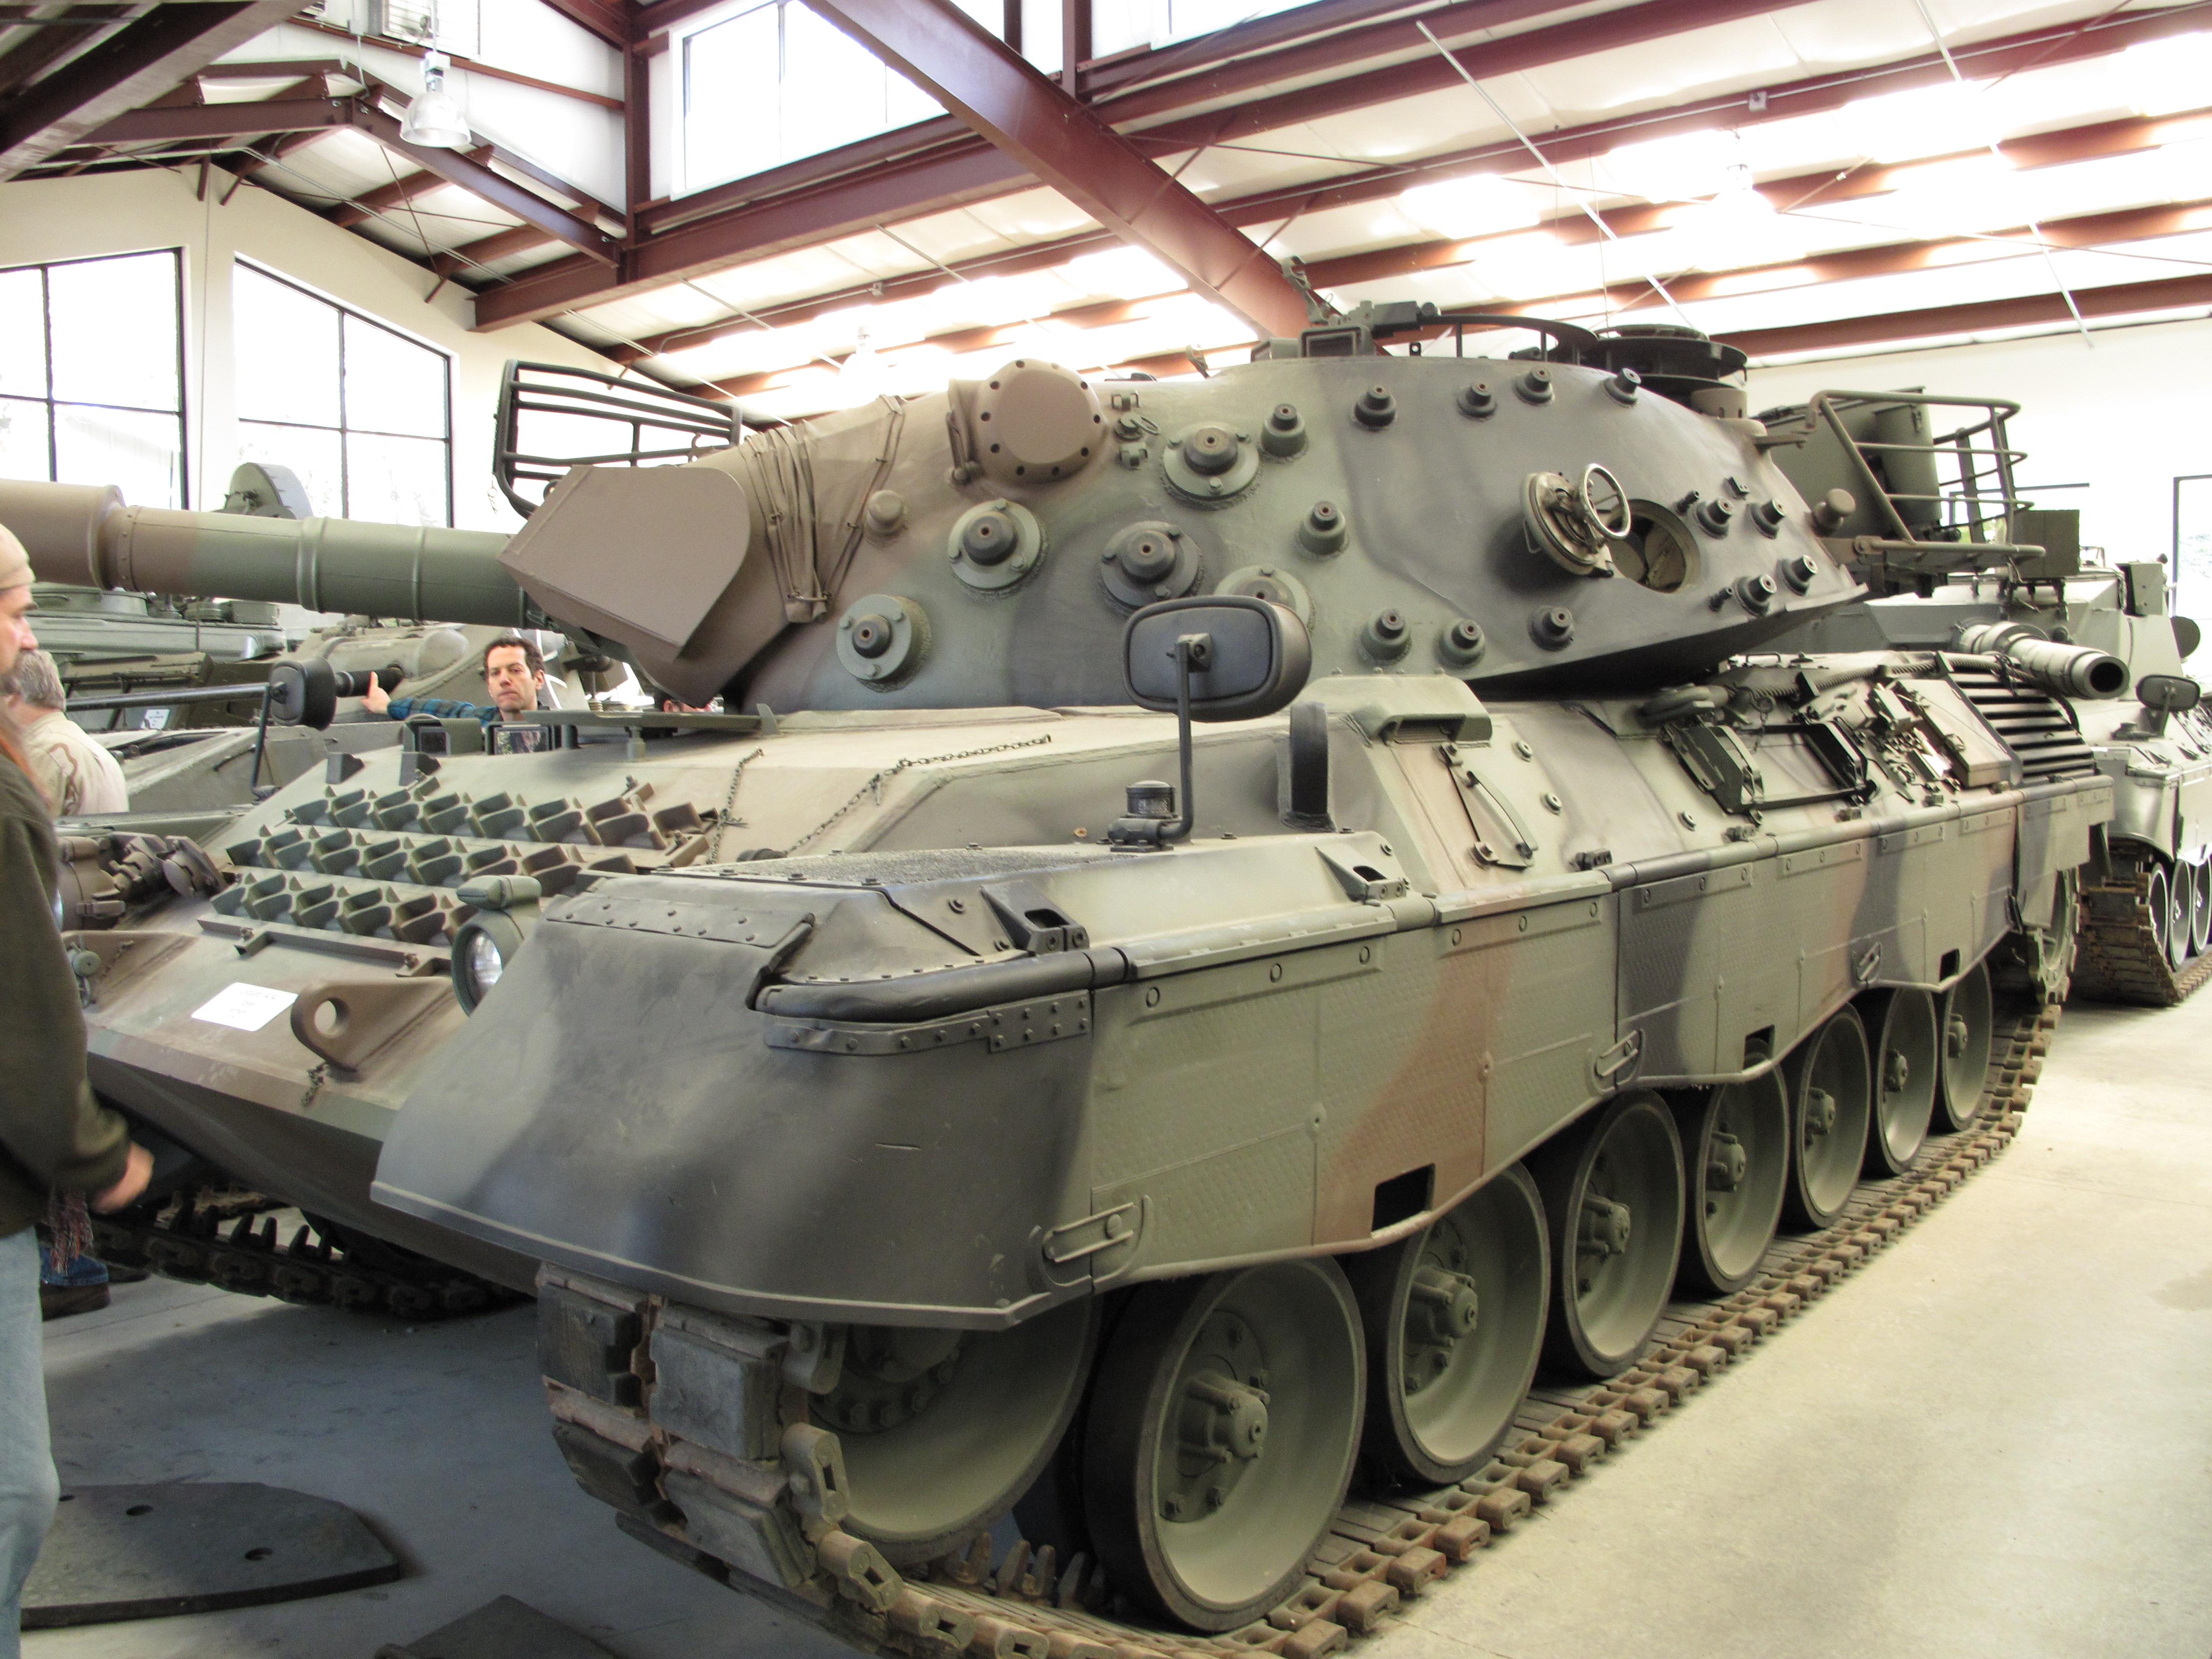 Leopard_1A1A1,_Military_Vehicle_Technolo